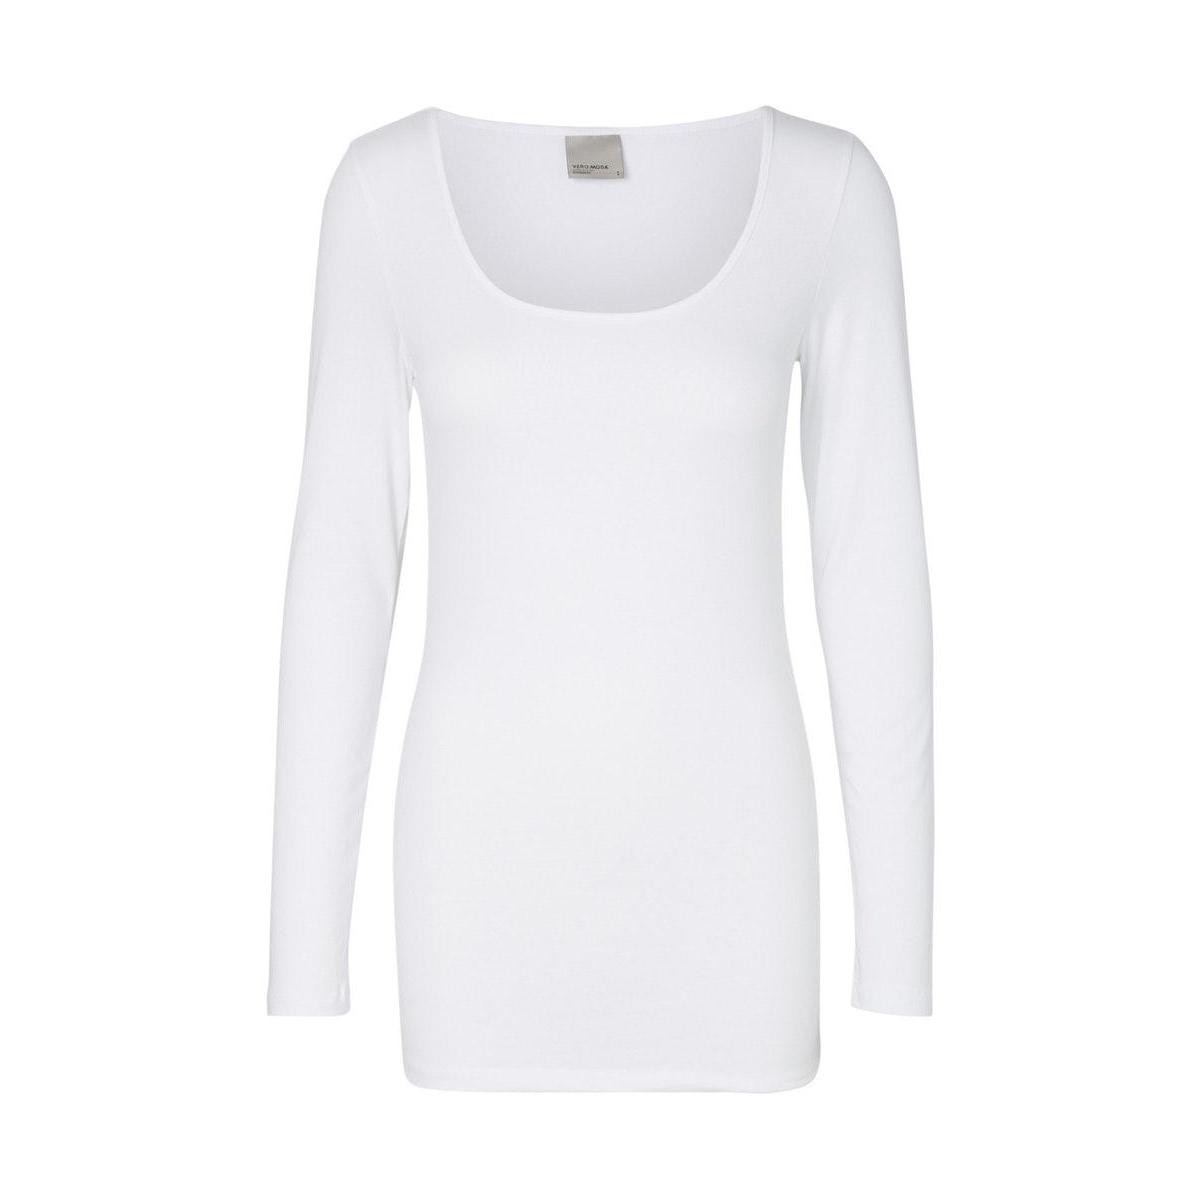 vmmaxi my ls soft long u-neck noos 10152908 vero moda t-shirt bright white